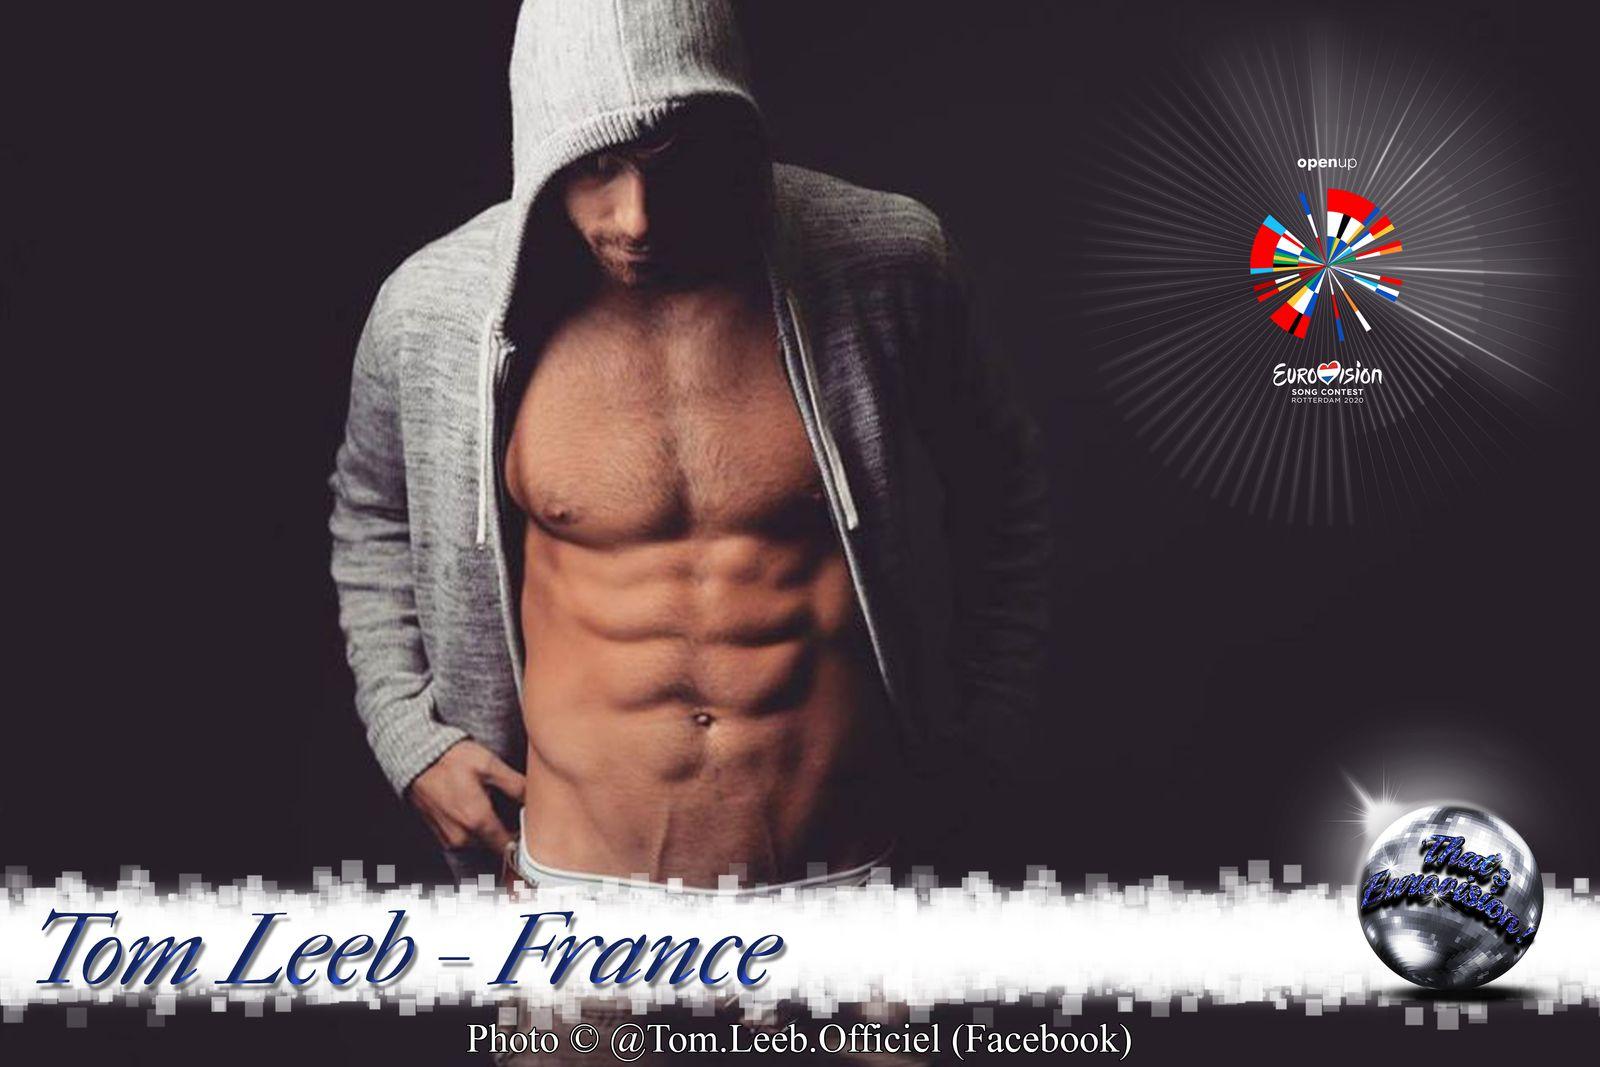 France 2020 - Tom LEEB